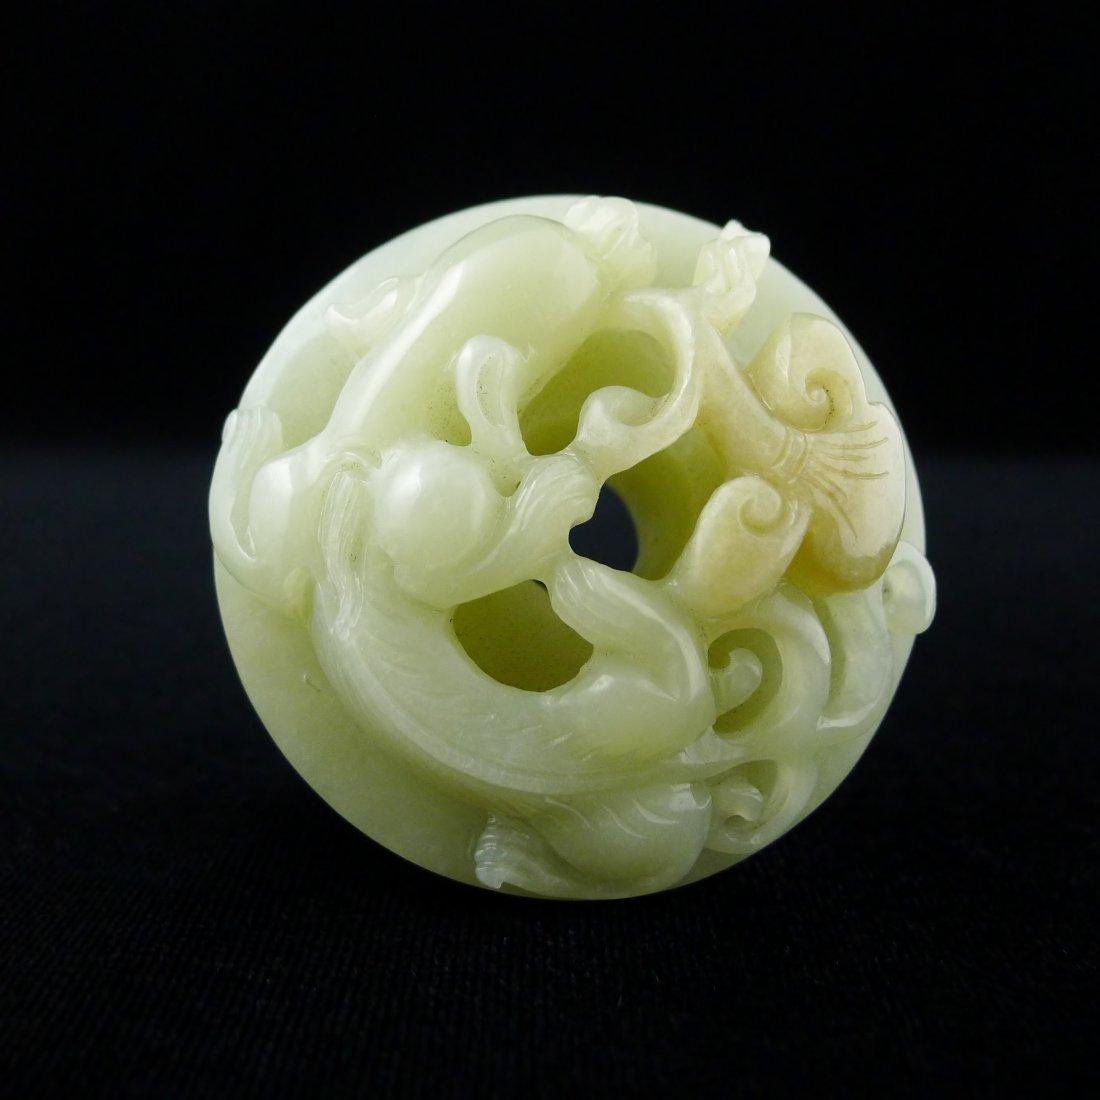 Chinese Xinjiang Nephrite Pendant